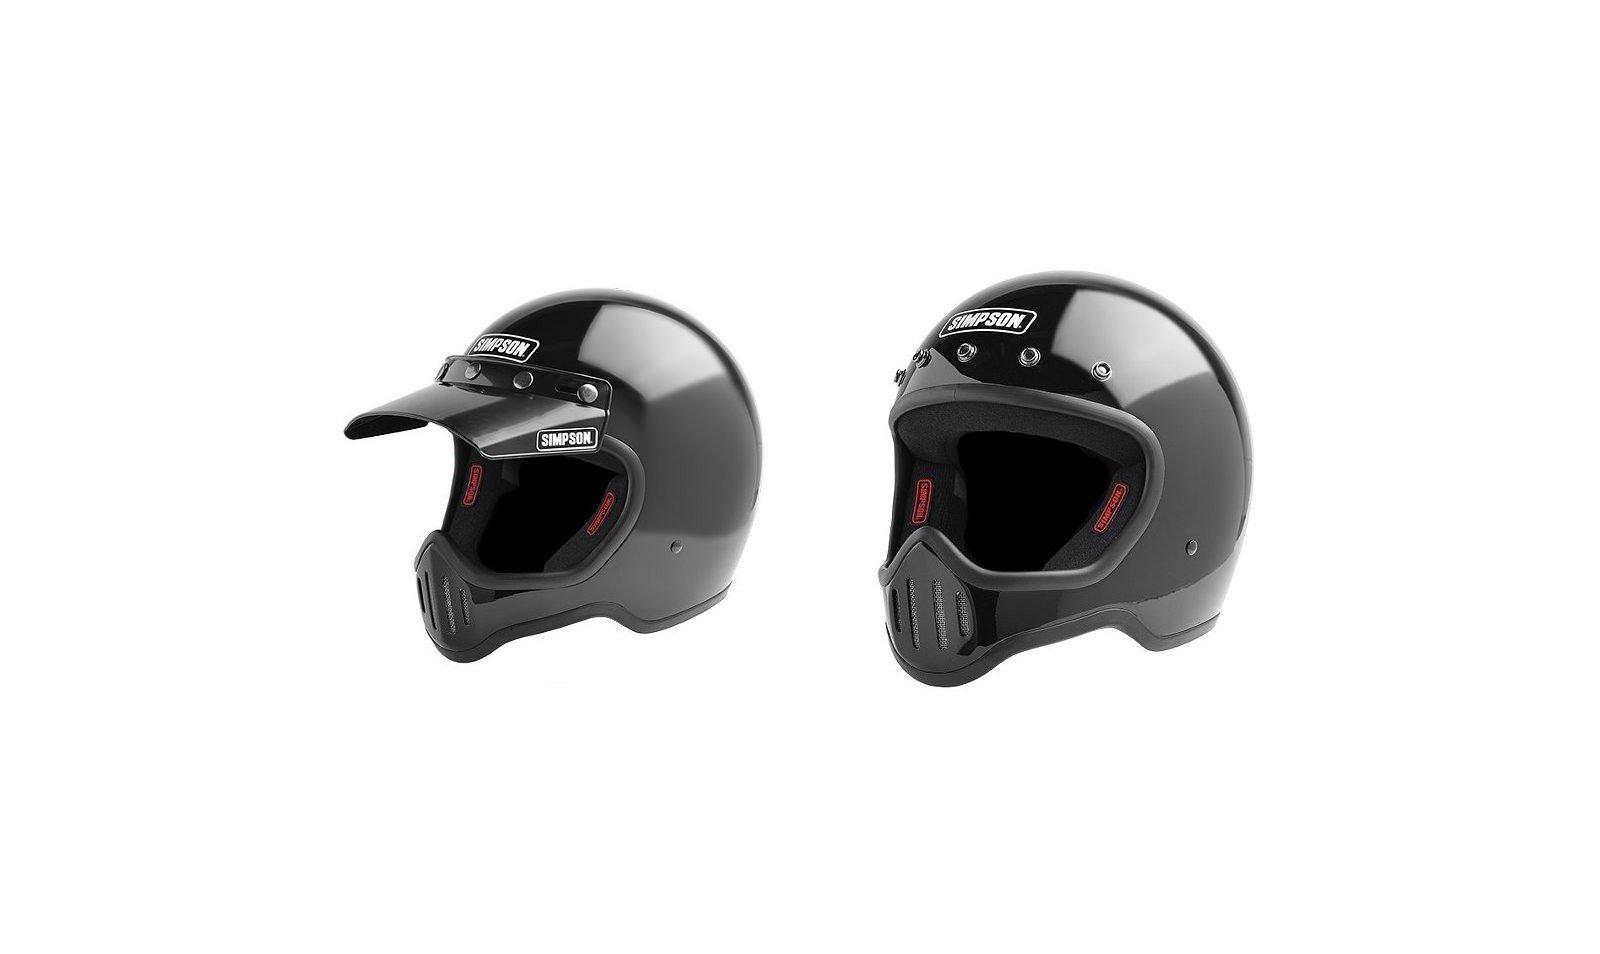 Simpson Model 50 Helmet 1600x954 - Simpson Model 50 Helmet